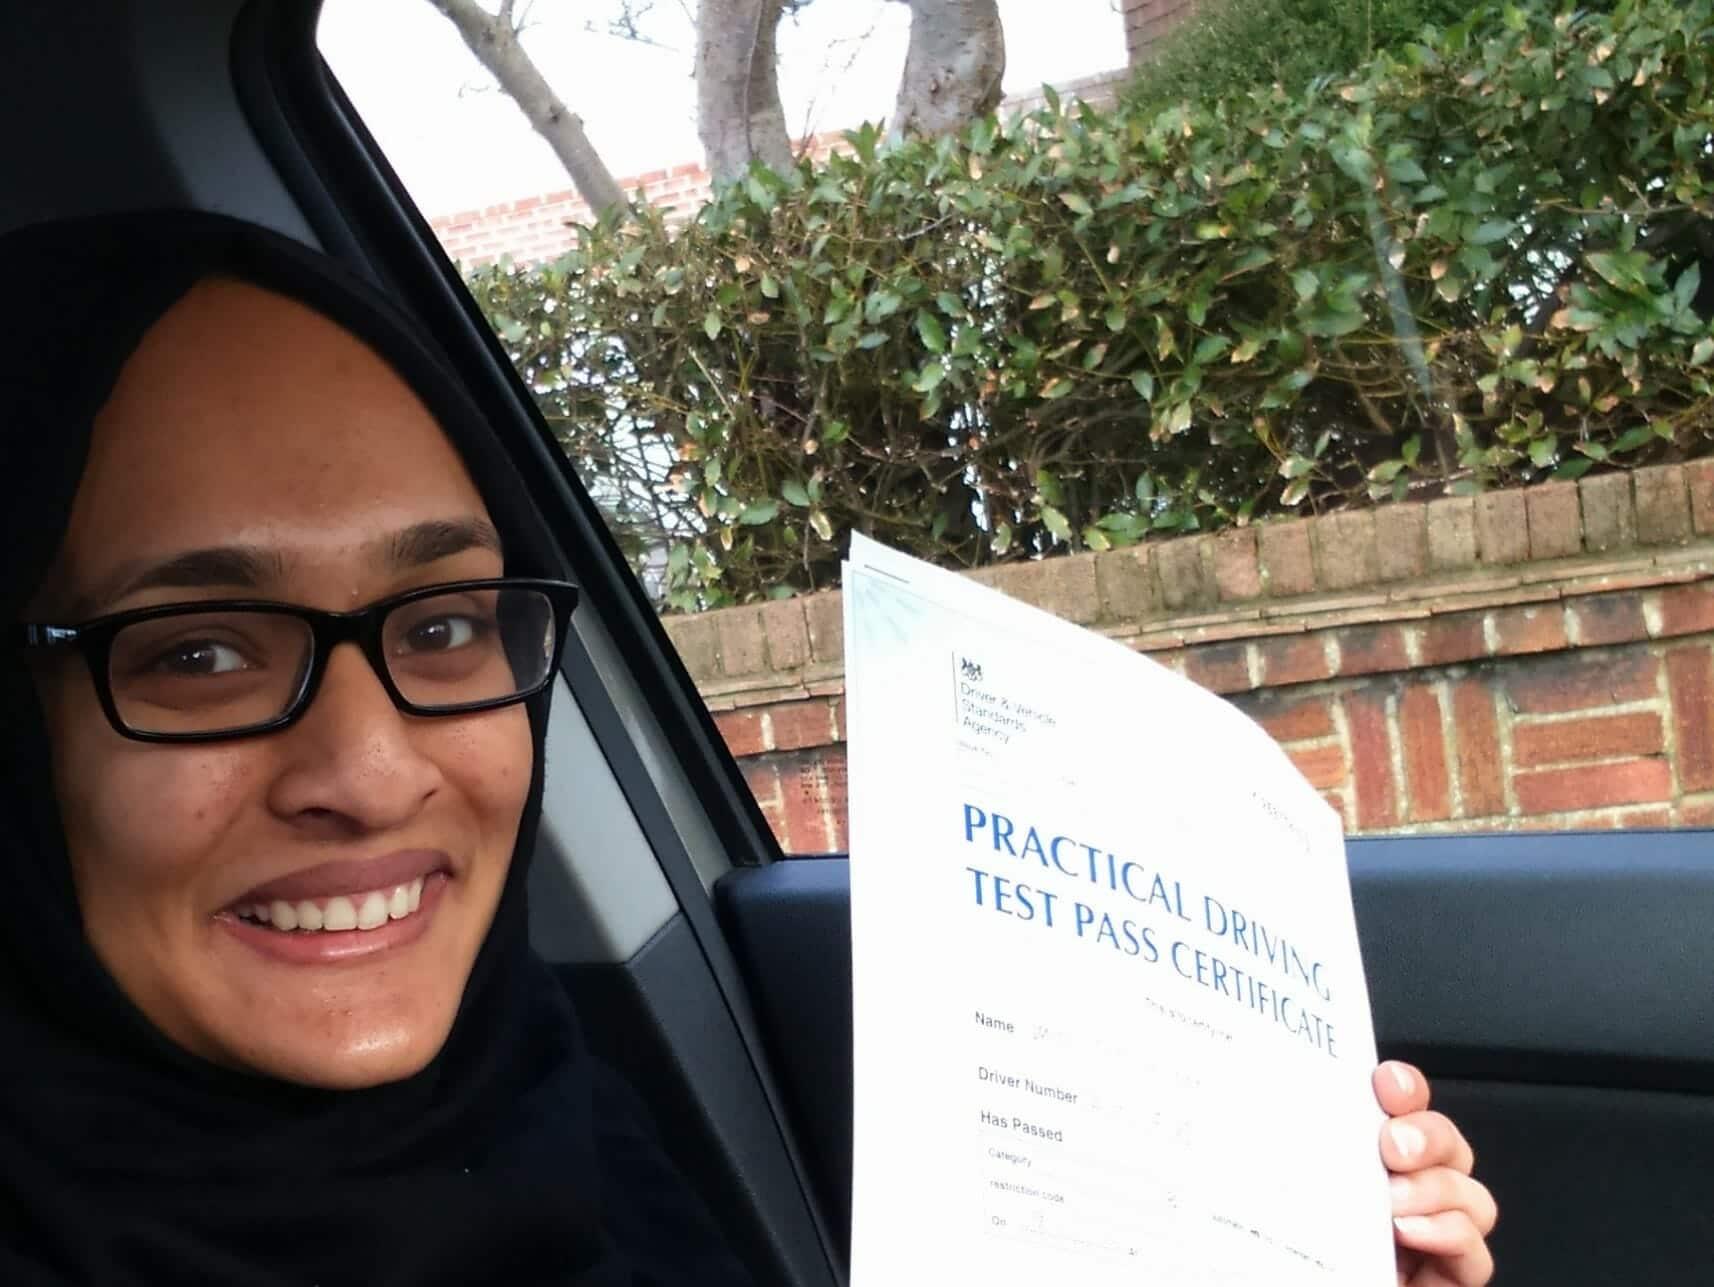 Congratulations to Samiha Azir from Worthing